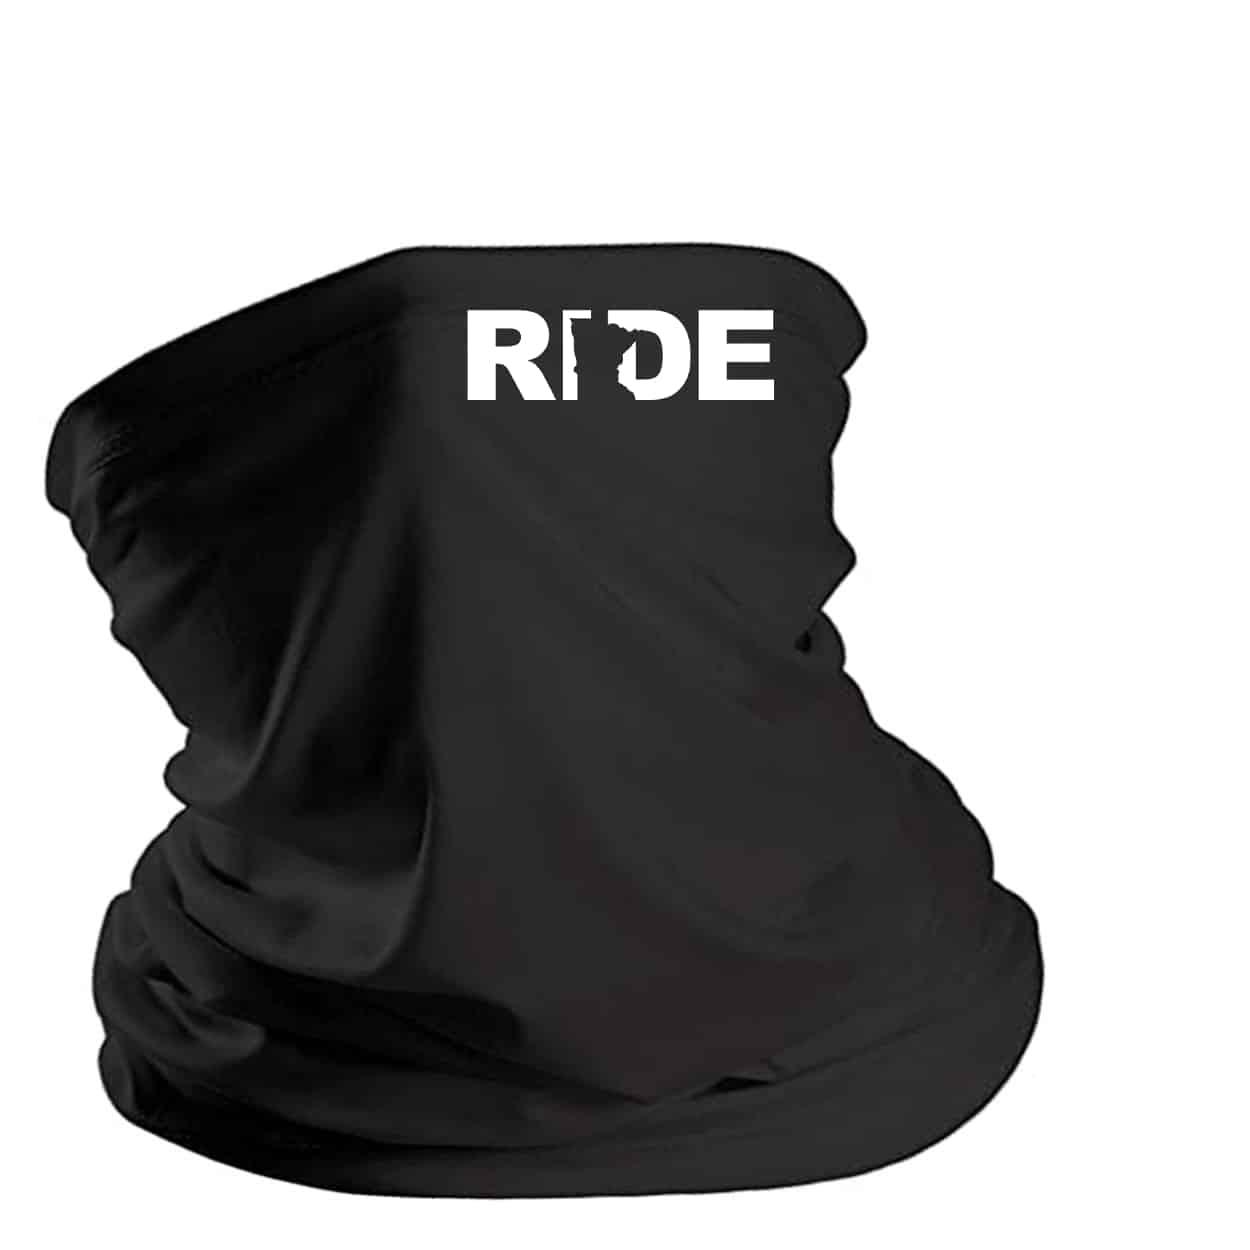 Ride Minnesota Night Out Lightweight Neck Gaiter Face Mask Black (White Logo)